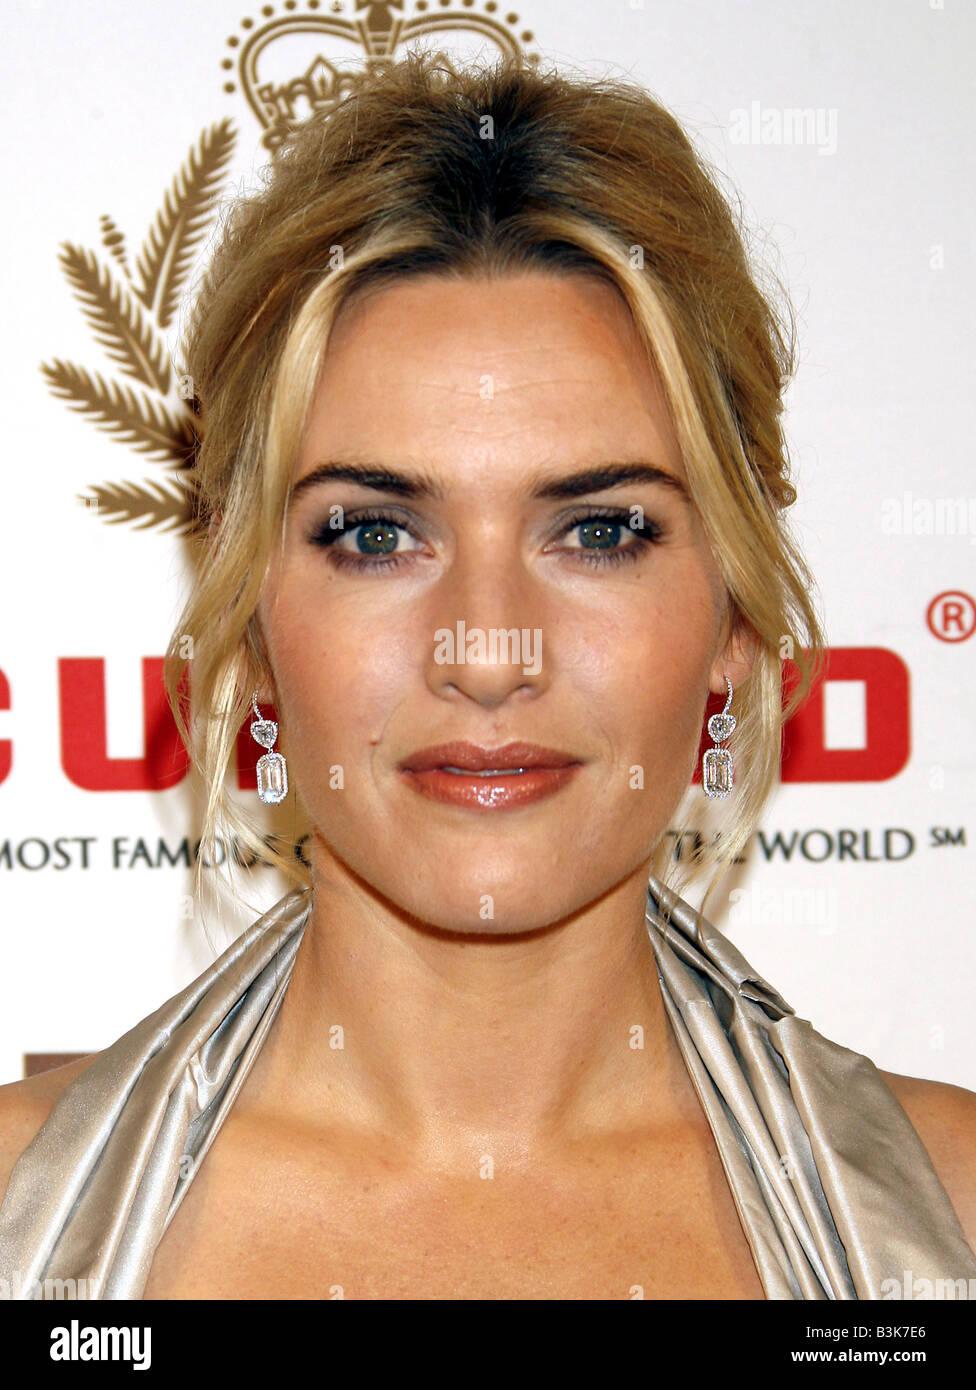 KATE WINSLET UK film actress in November 2007 - Stock Image